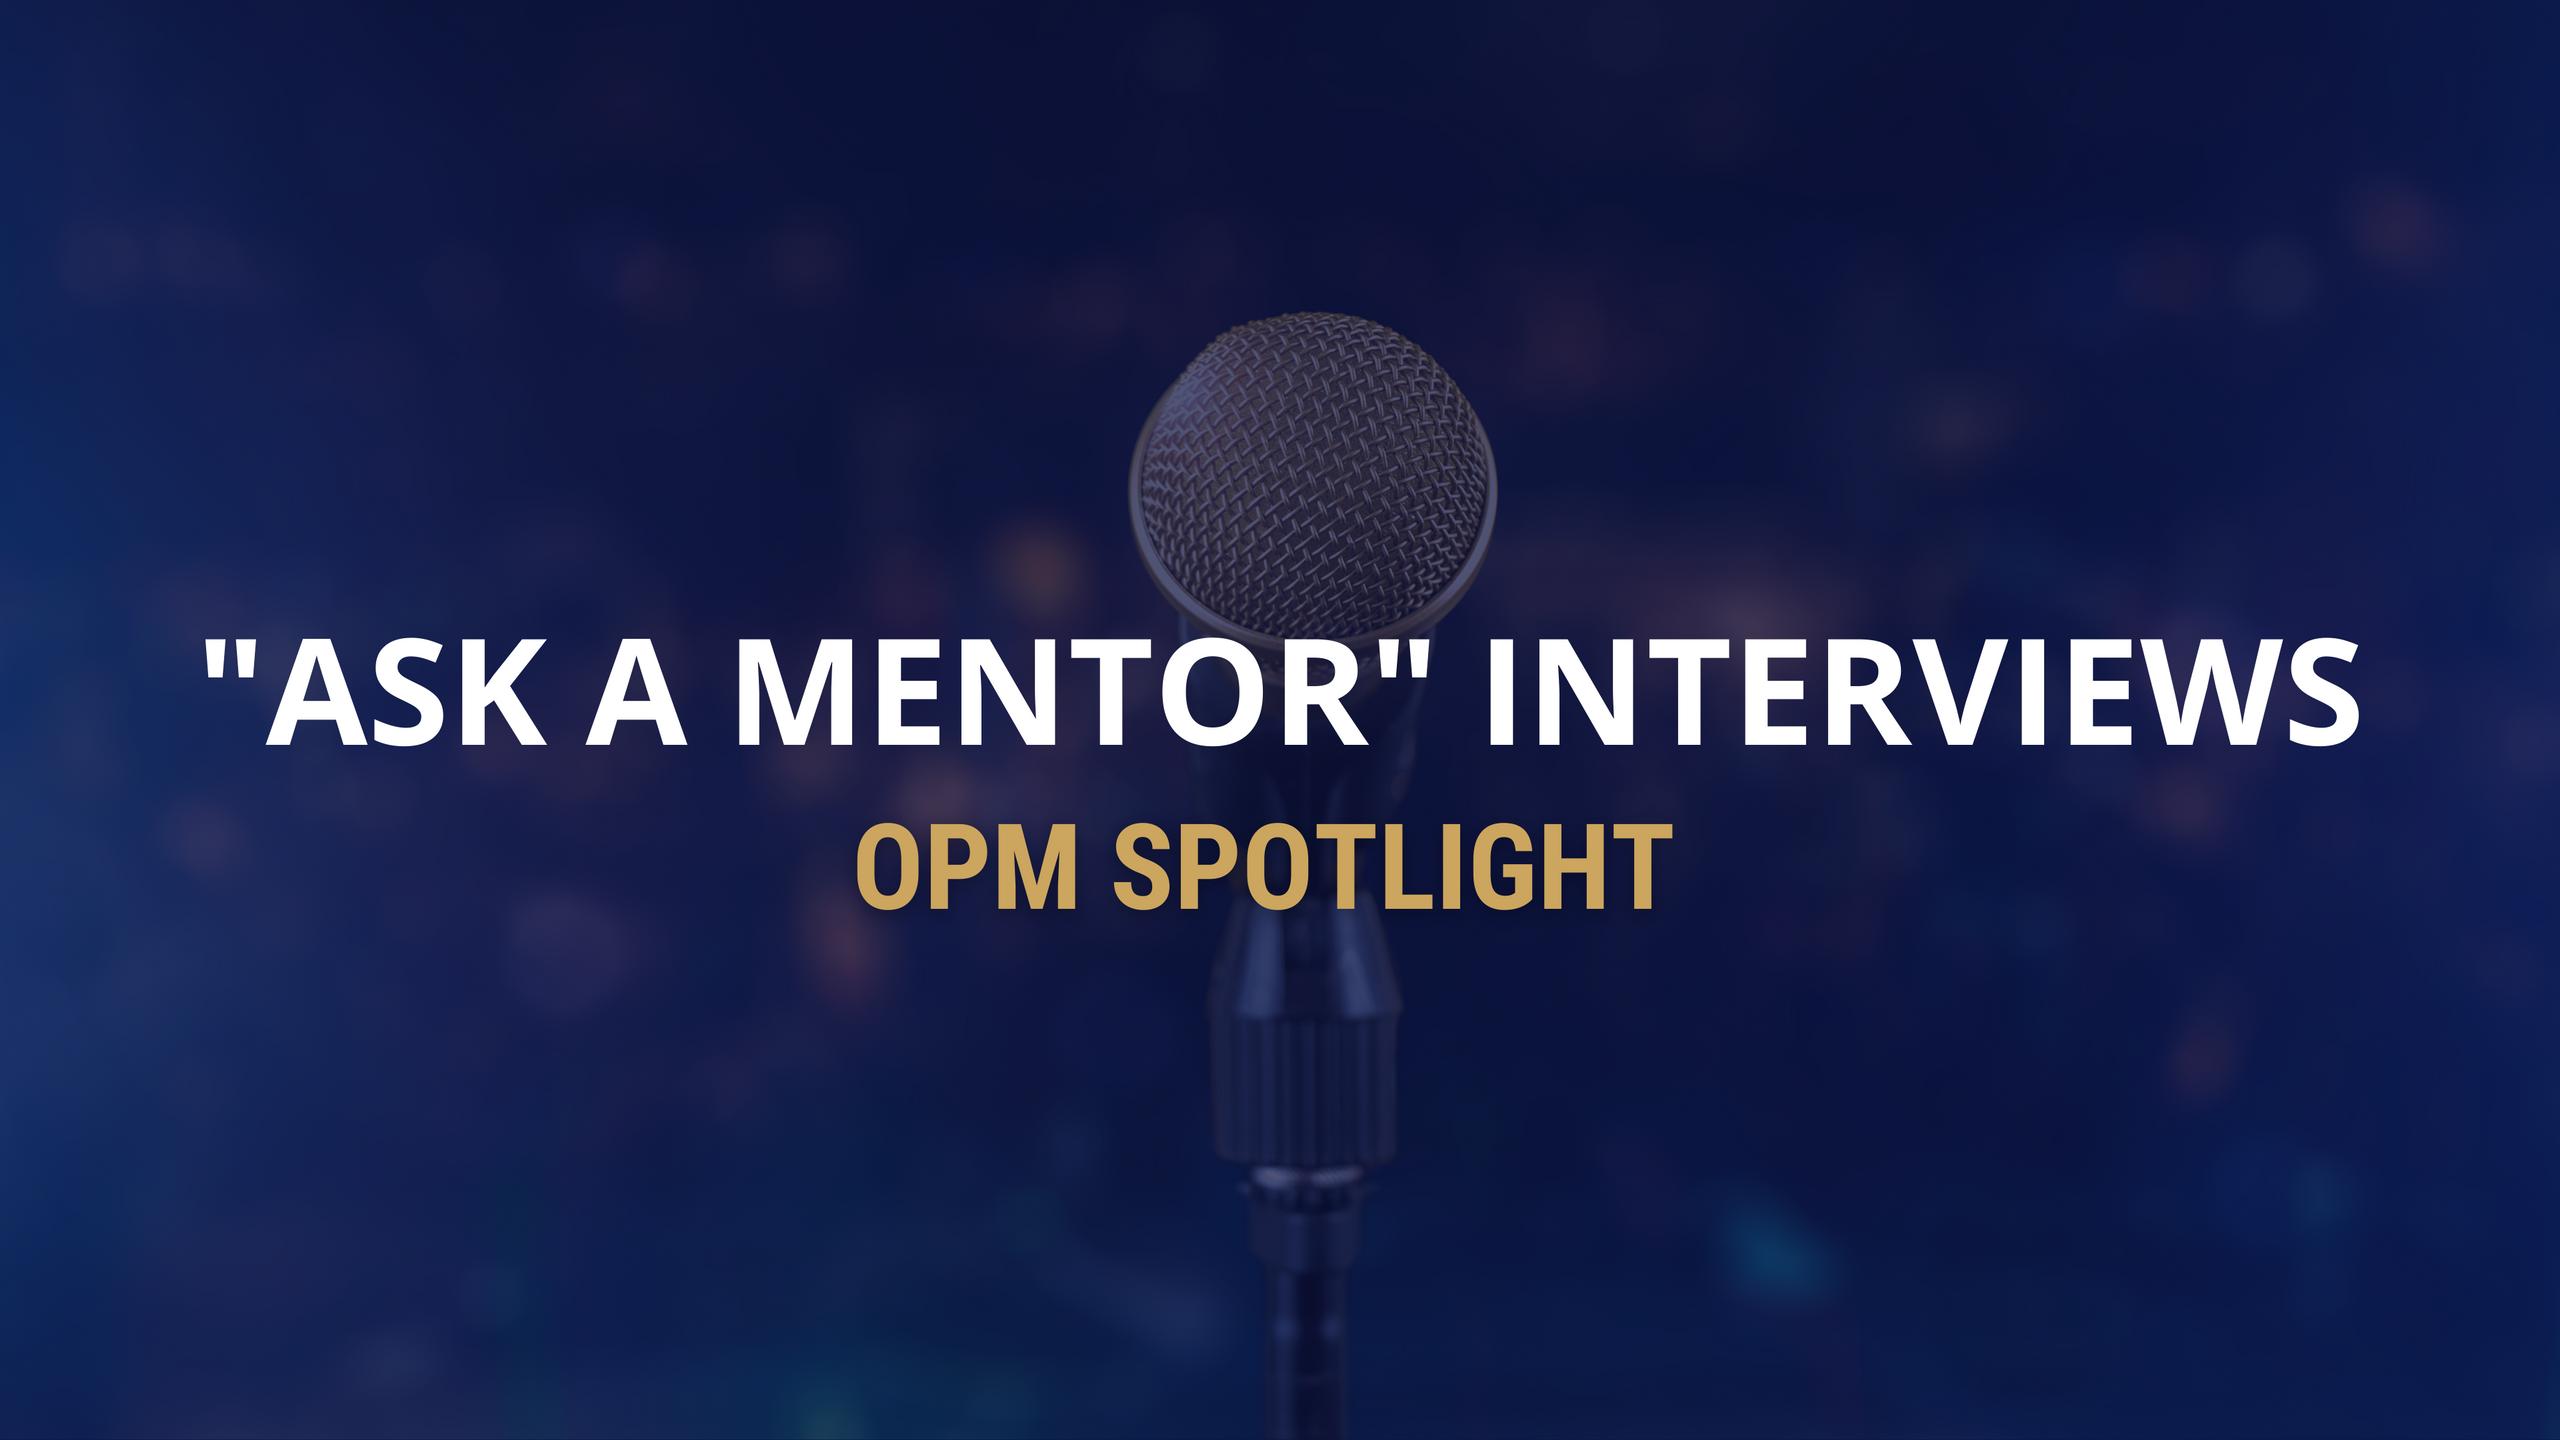 Ask a Mentor Spotlight Interviews